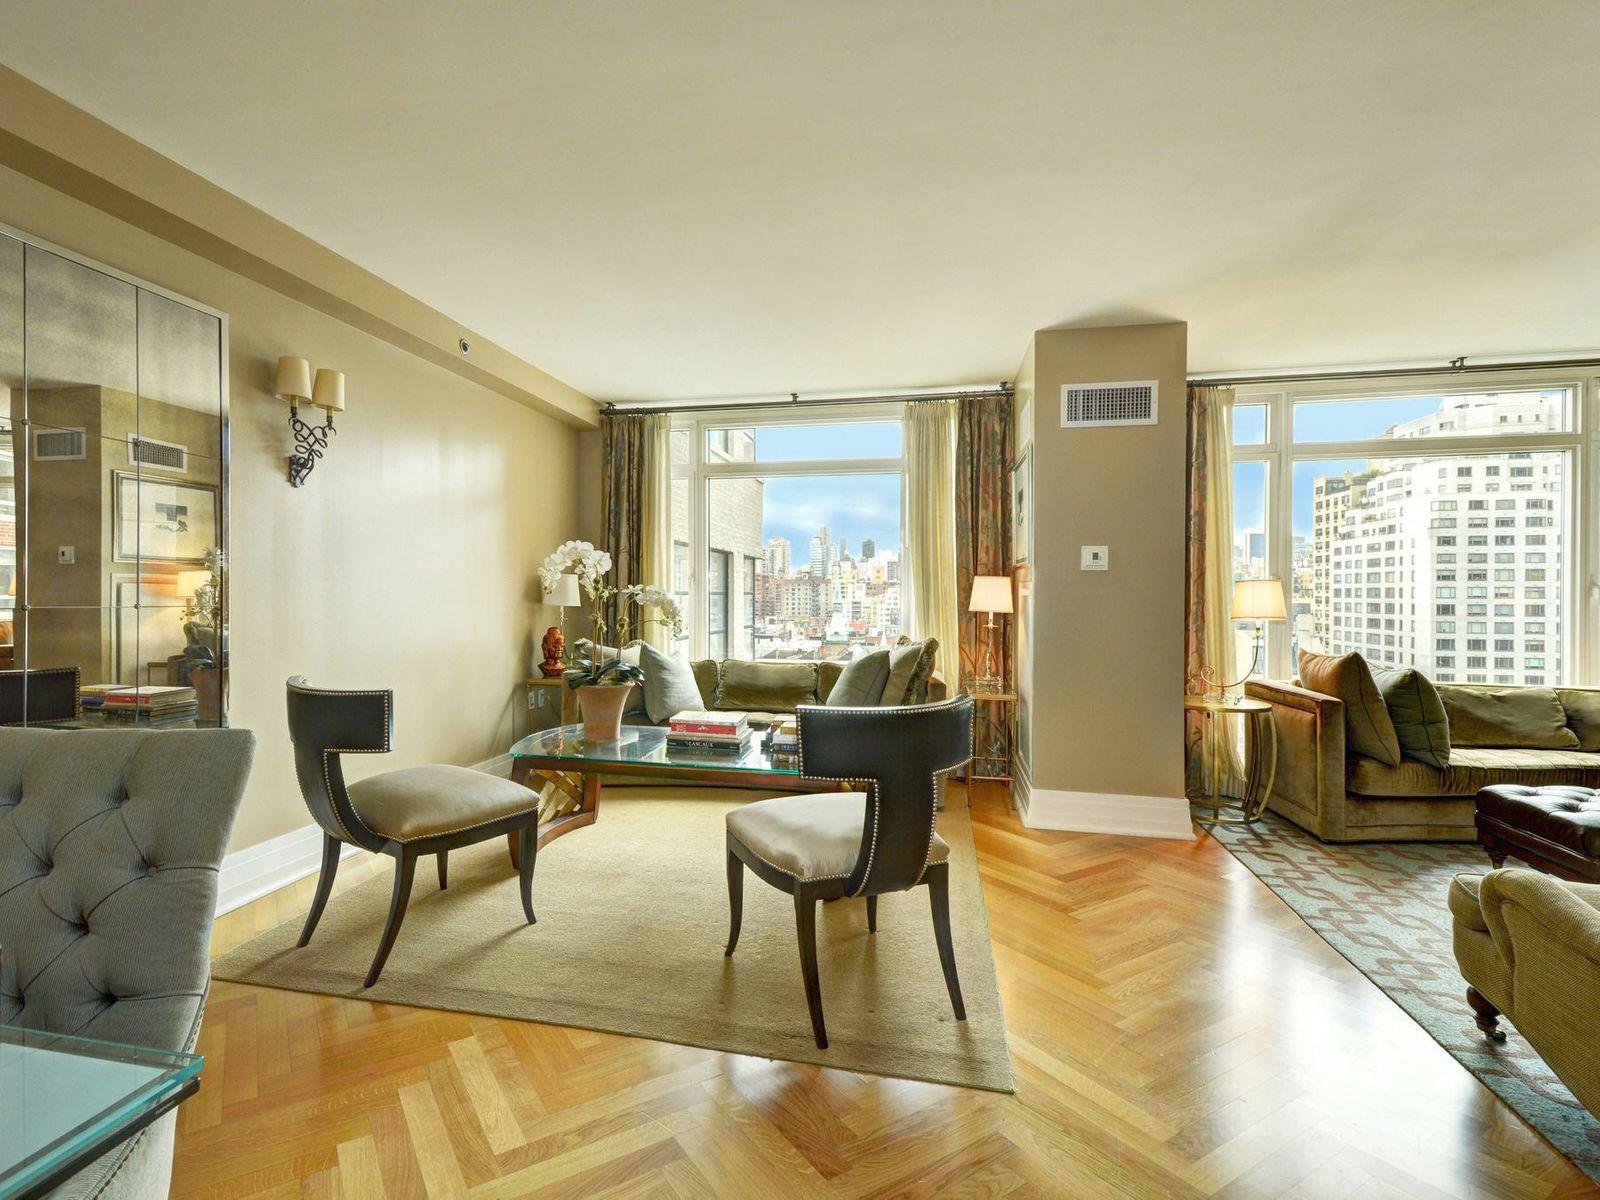 The Brompton, E. 85th – 4 Bedroom Rental